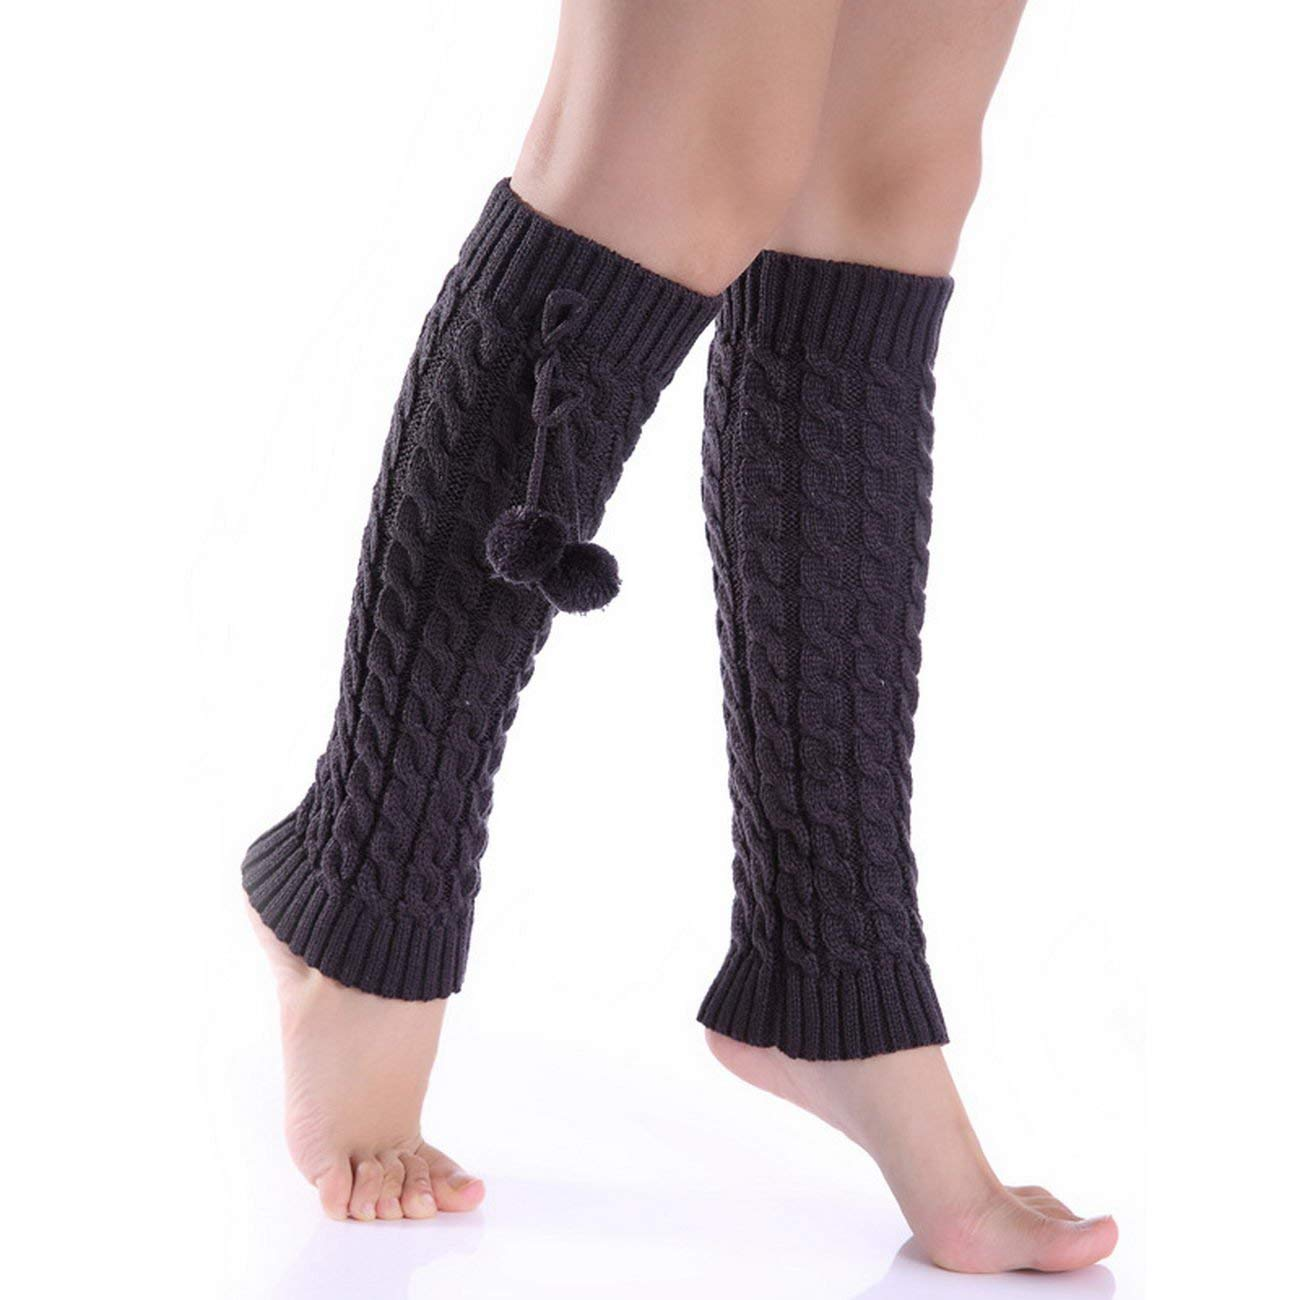 51ddbd0962 Get Quotations · KUAILEJIA ball loose socks wool socks autumn and winter  socks piles of socks leg sets leg